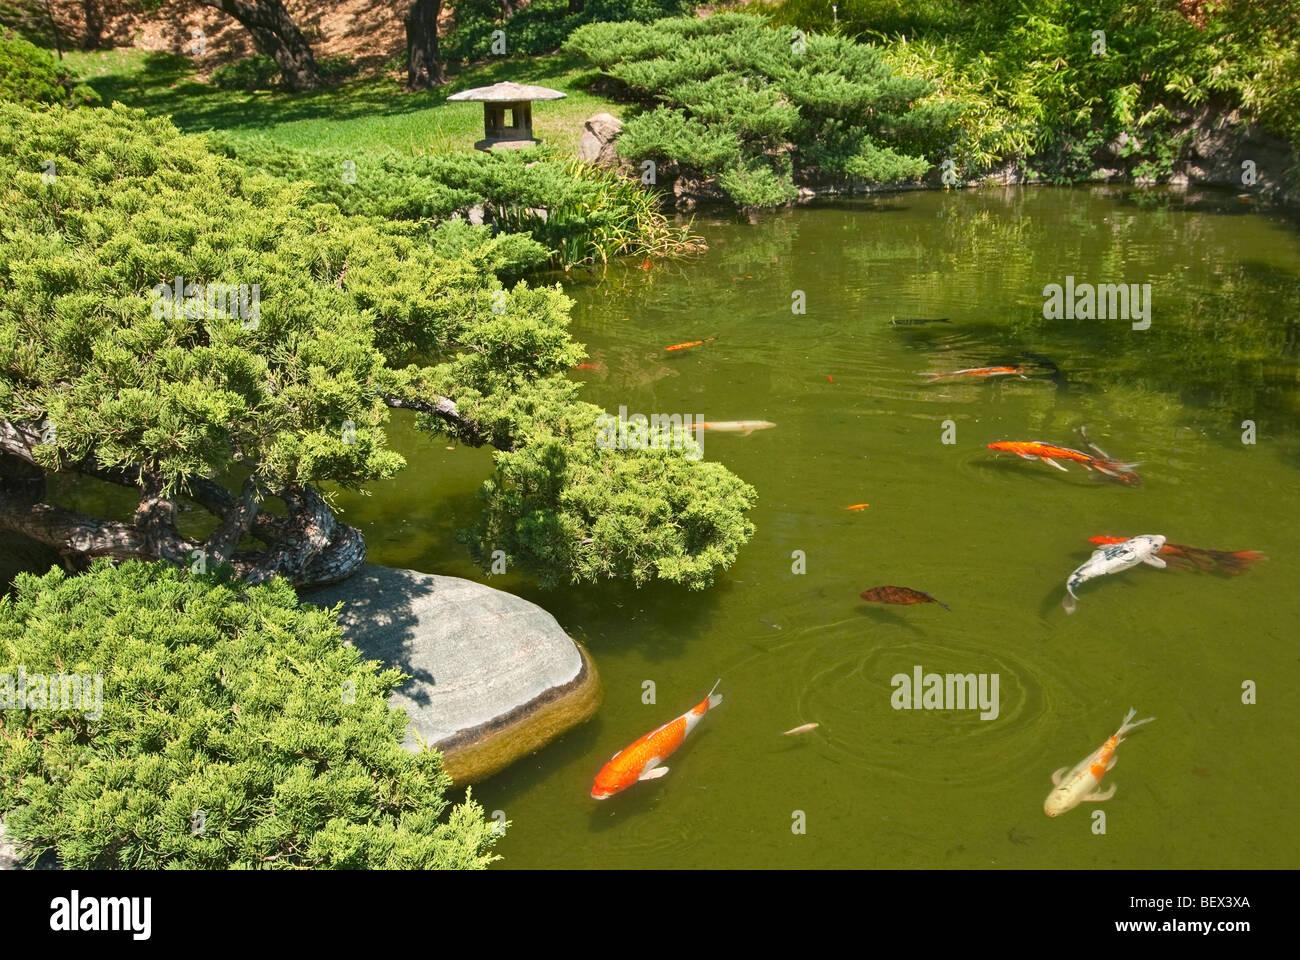 koi fish in the huntington librarys japanese garden